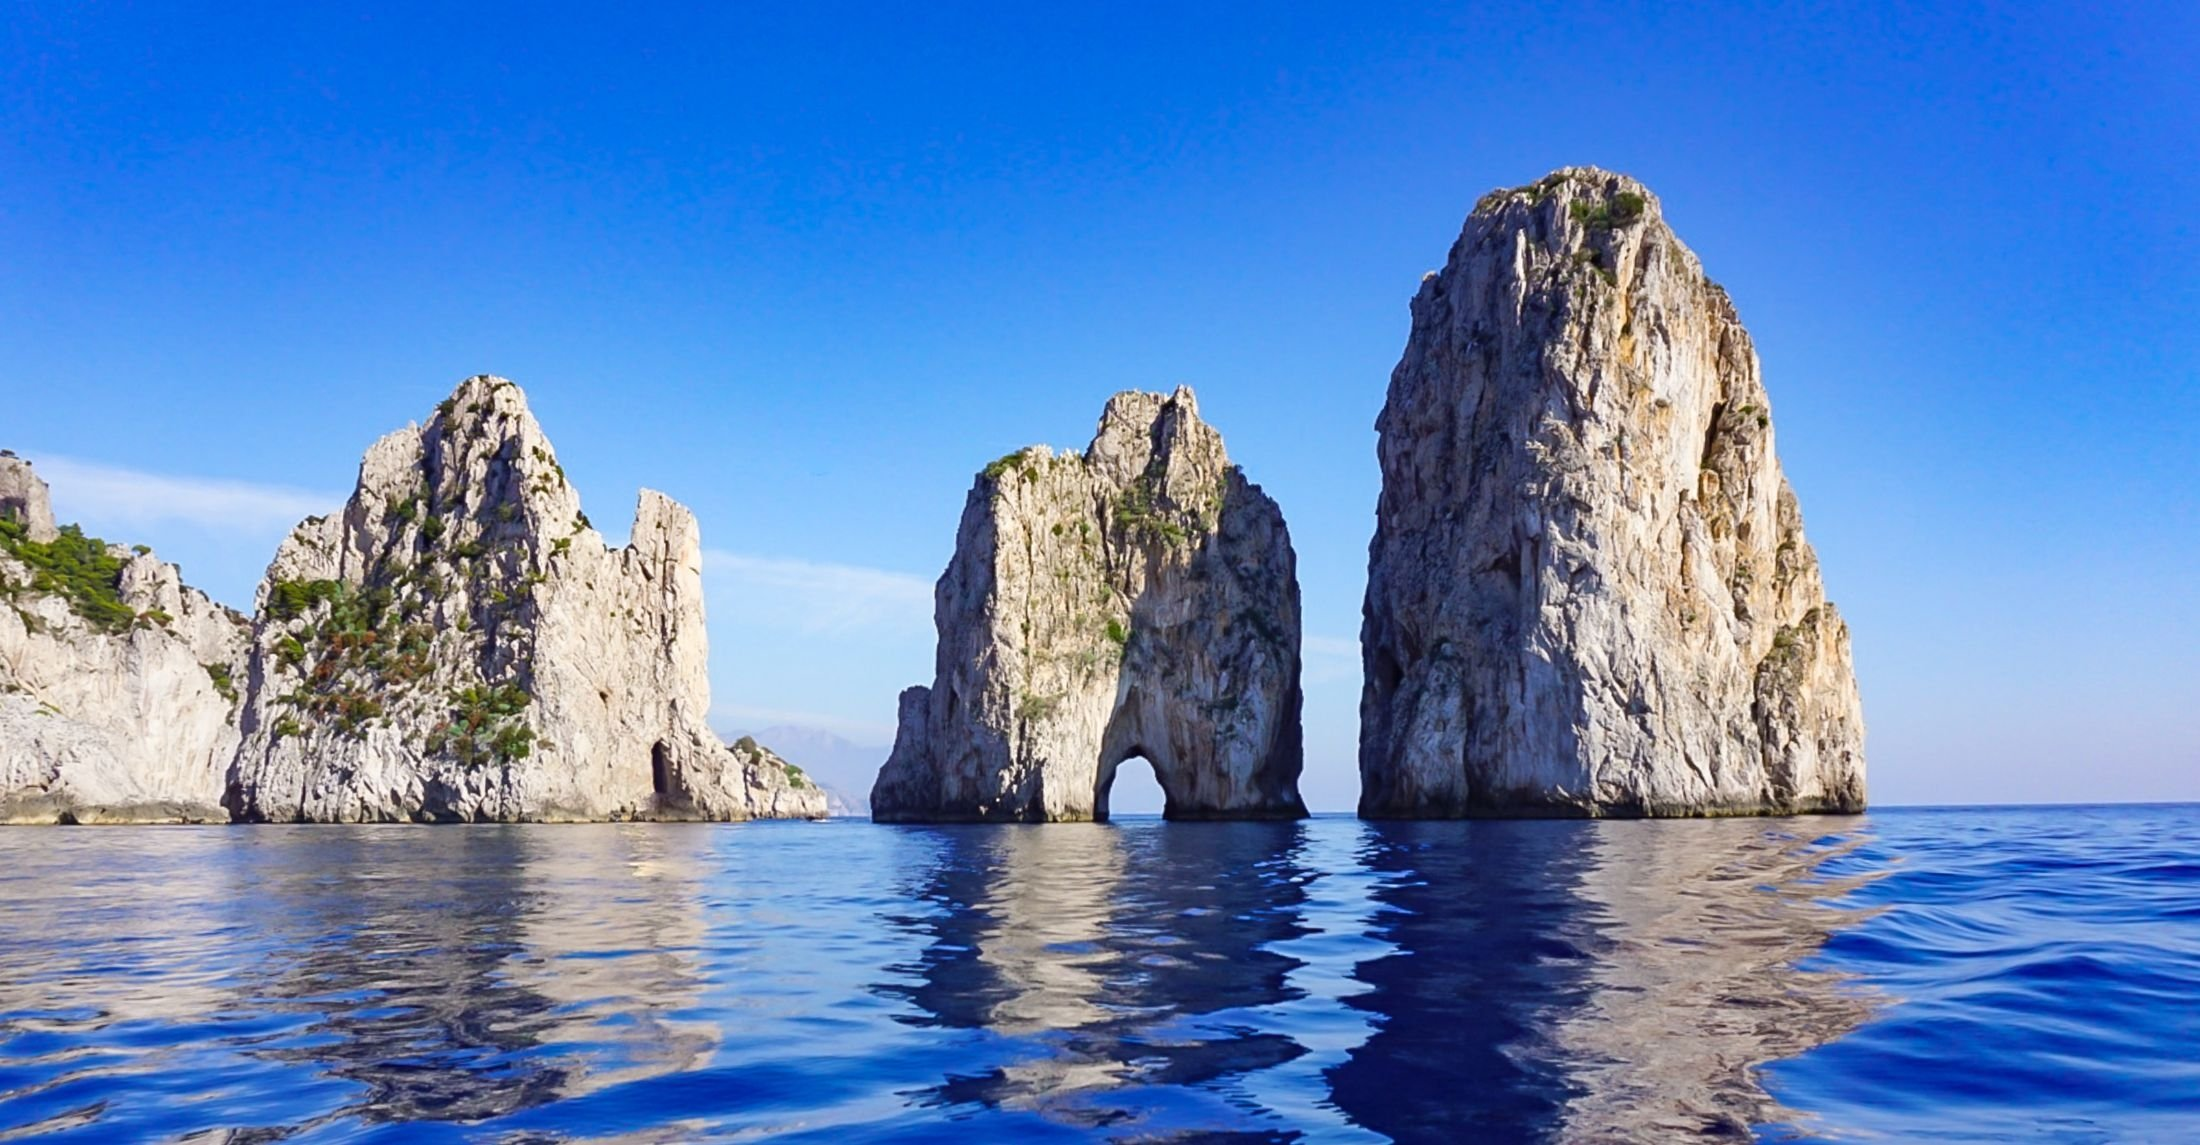 The Faraglioni rocks off the coast of the island of Capri, Italy. (Shutterstock Photo)